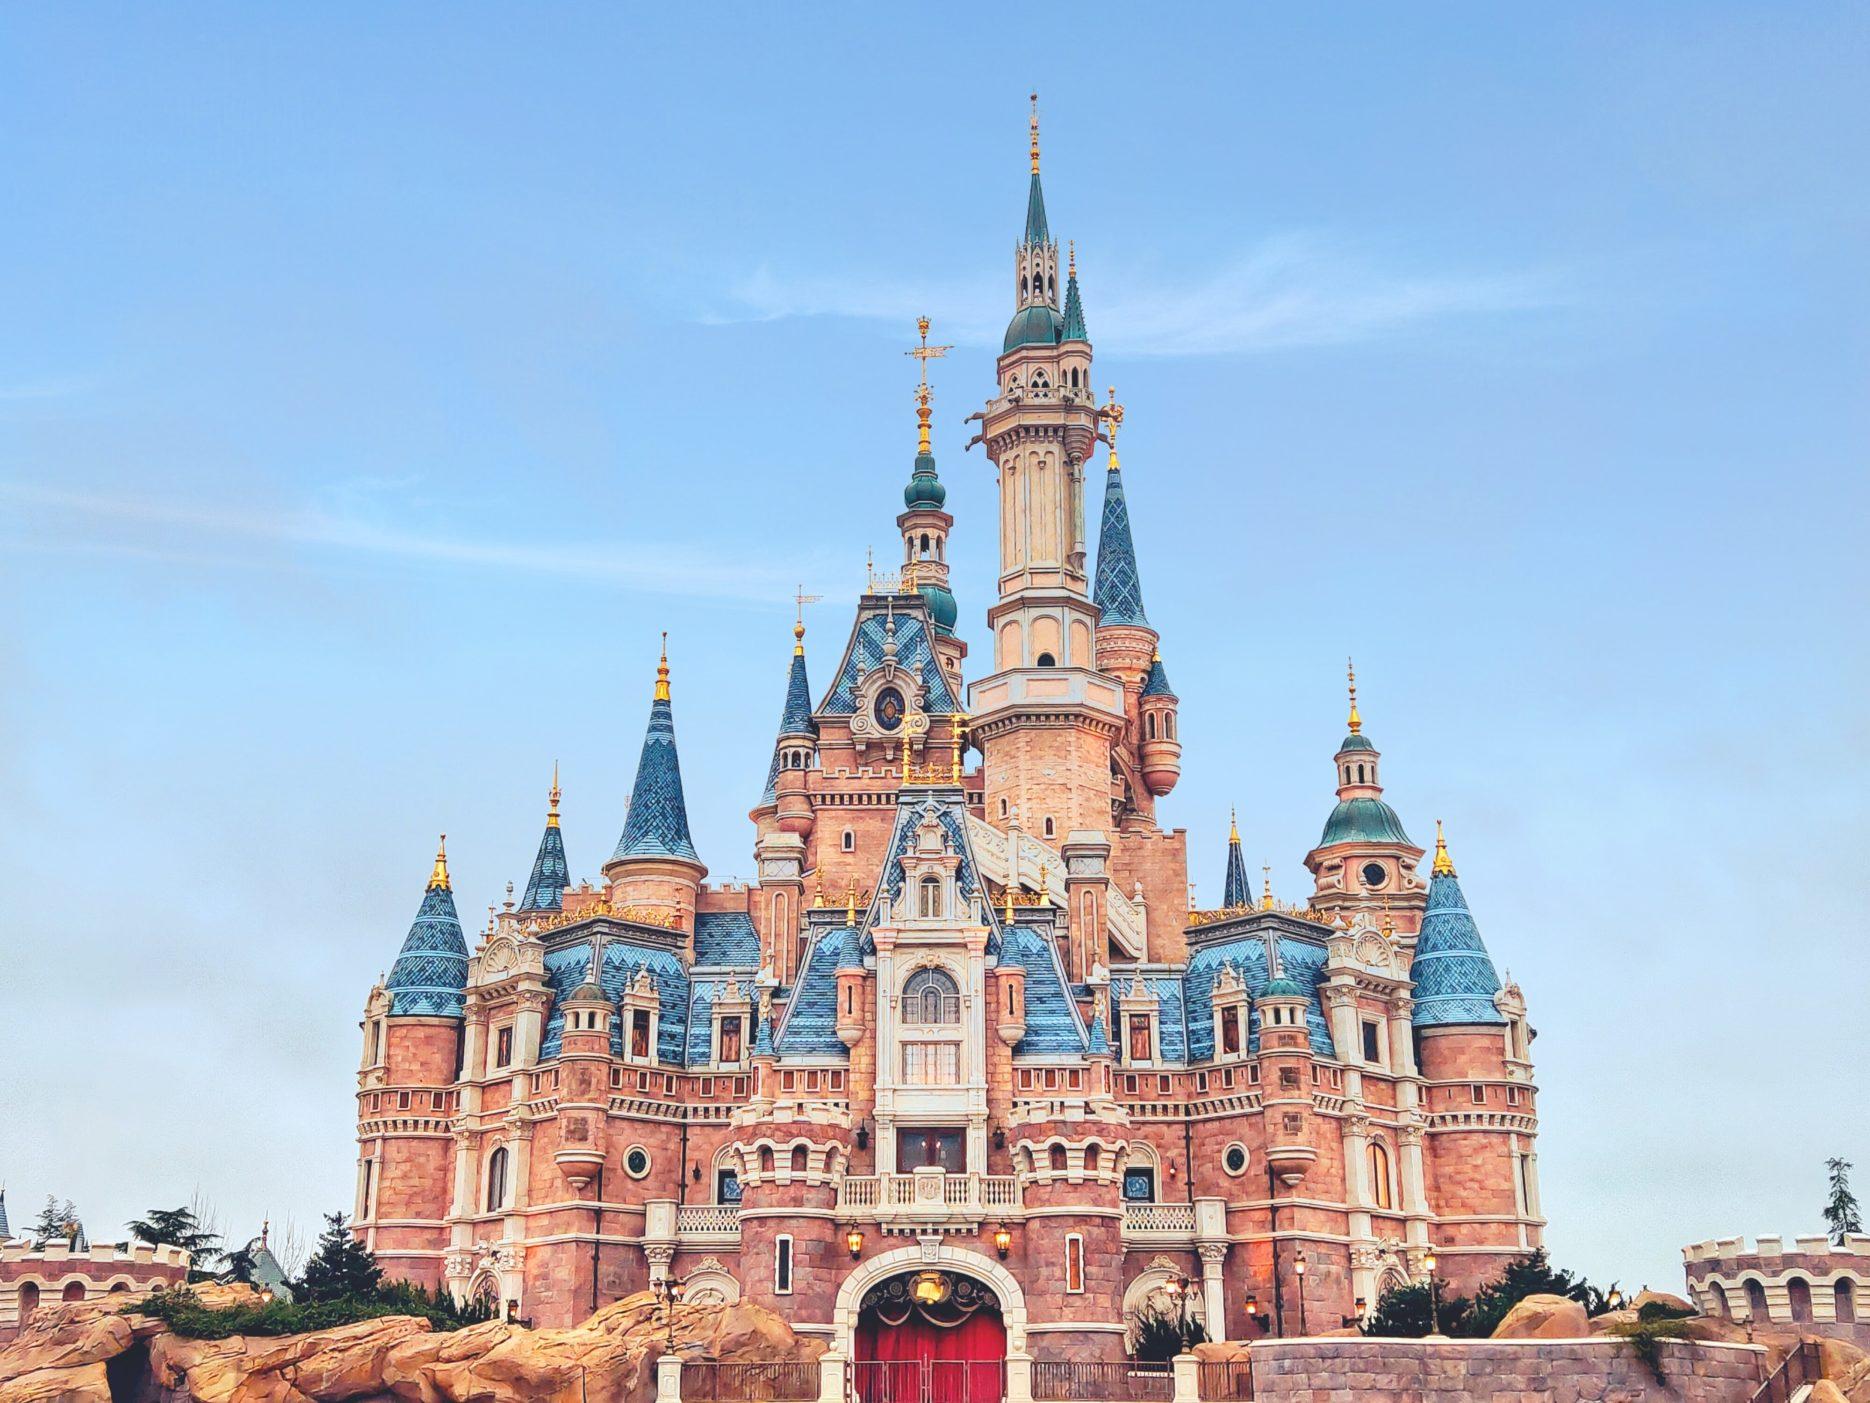 Shanghai Disneyland. Credit: Unsplash